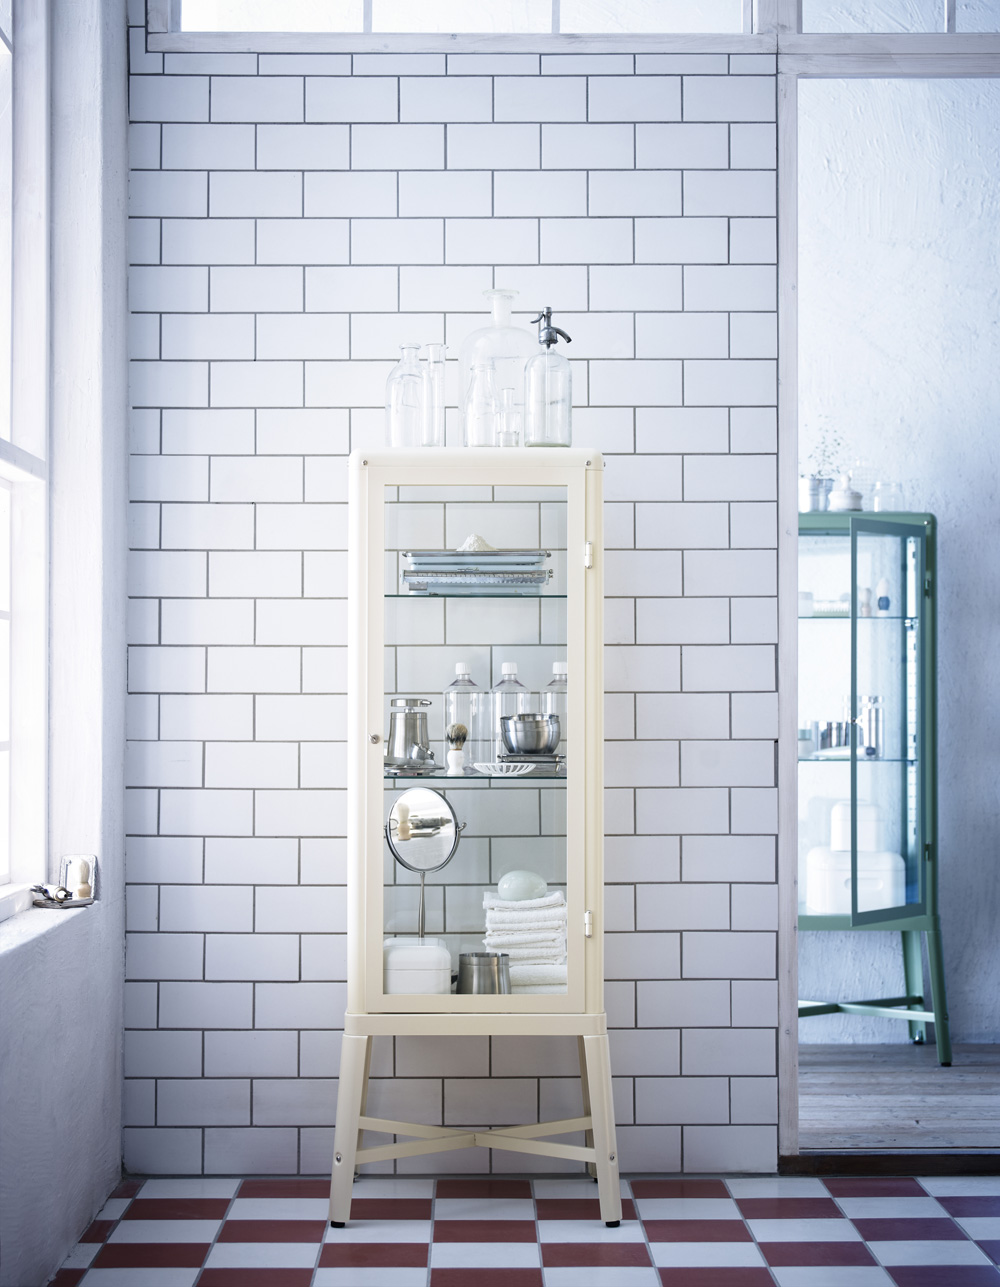 IKEA news april 2013, FABRIKÖR – Husligheter.se